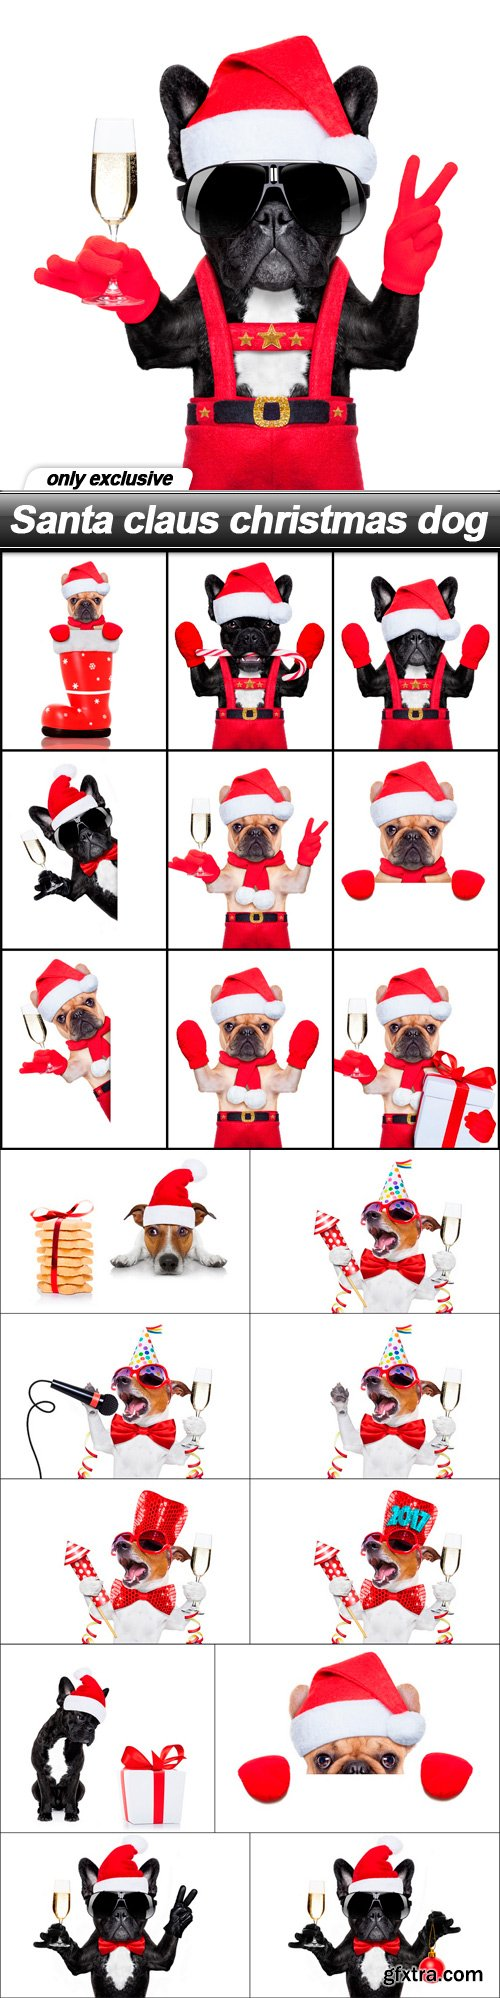 Santa claus christmas dog - 20 UHQ JPEG